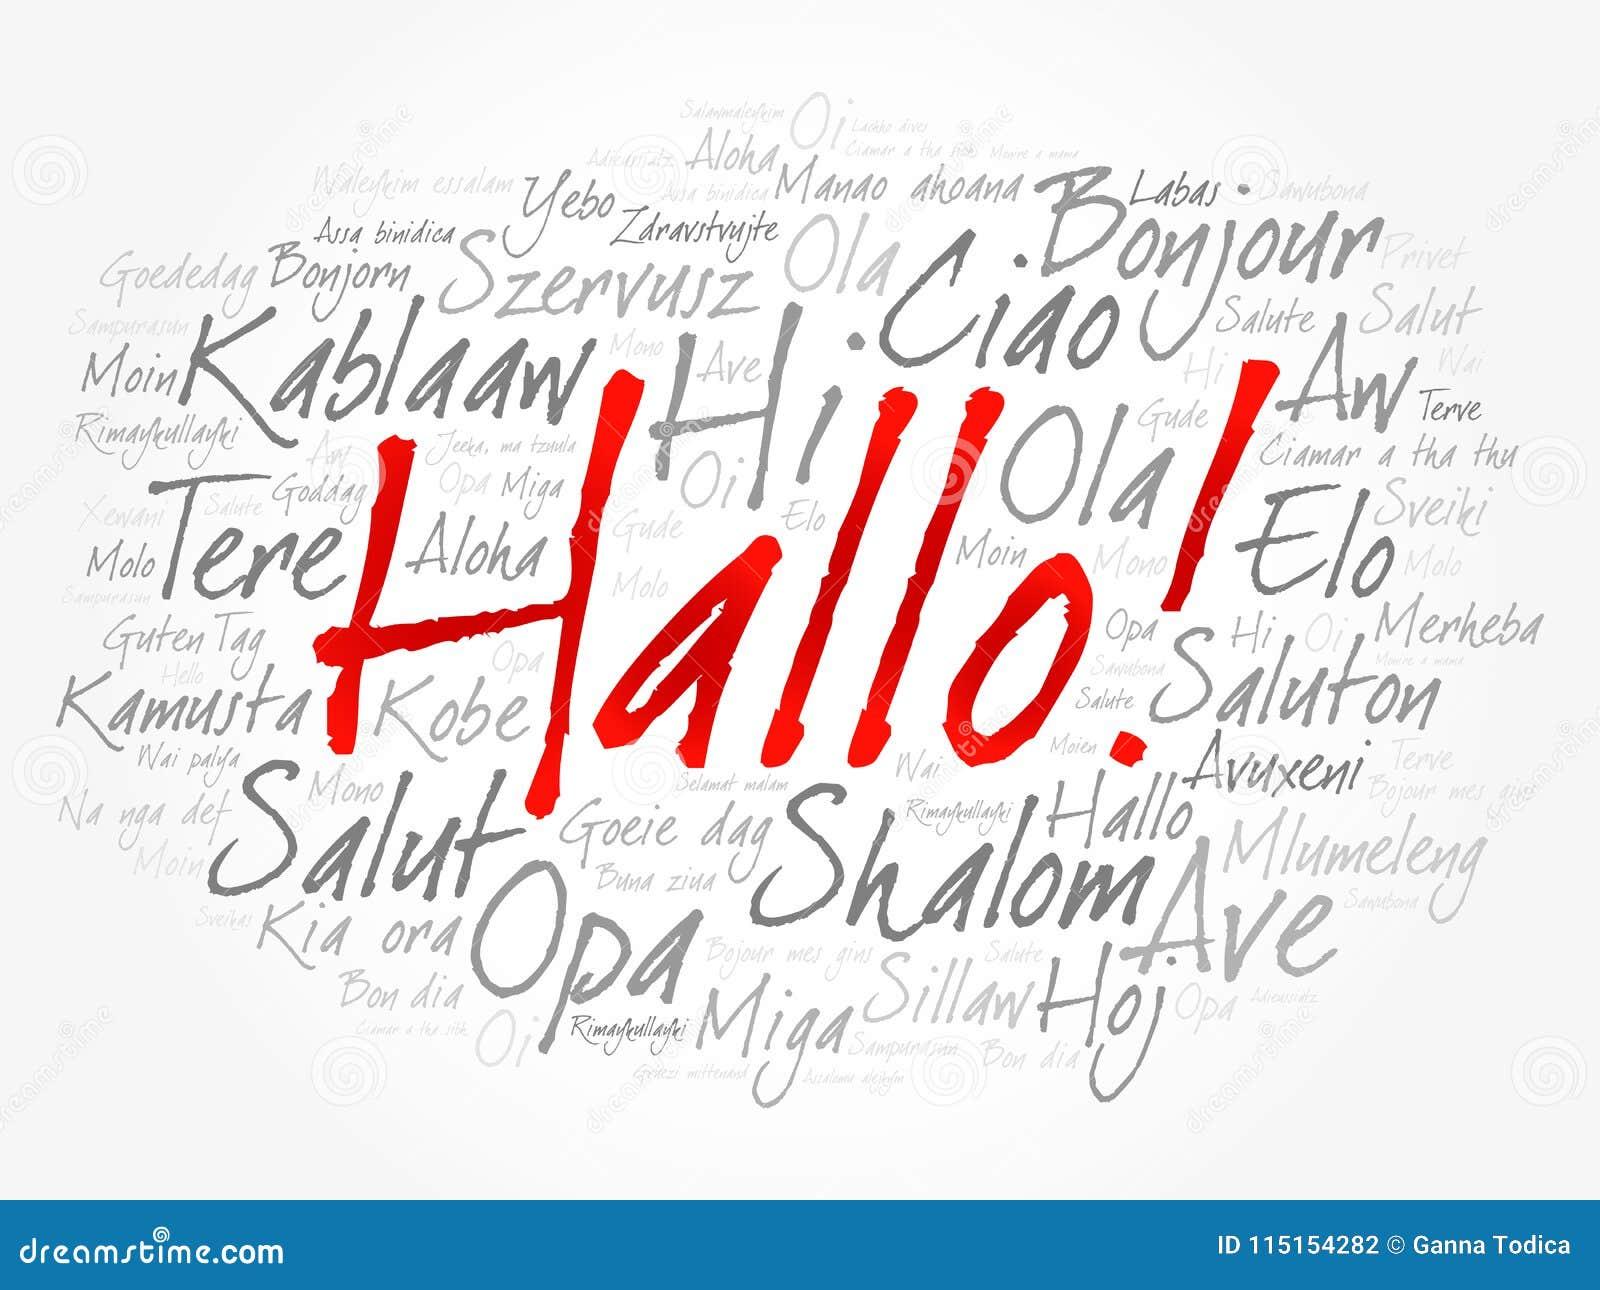 Hallo Hello Greeting In German Word Cloud Stock Illustration